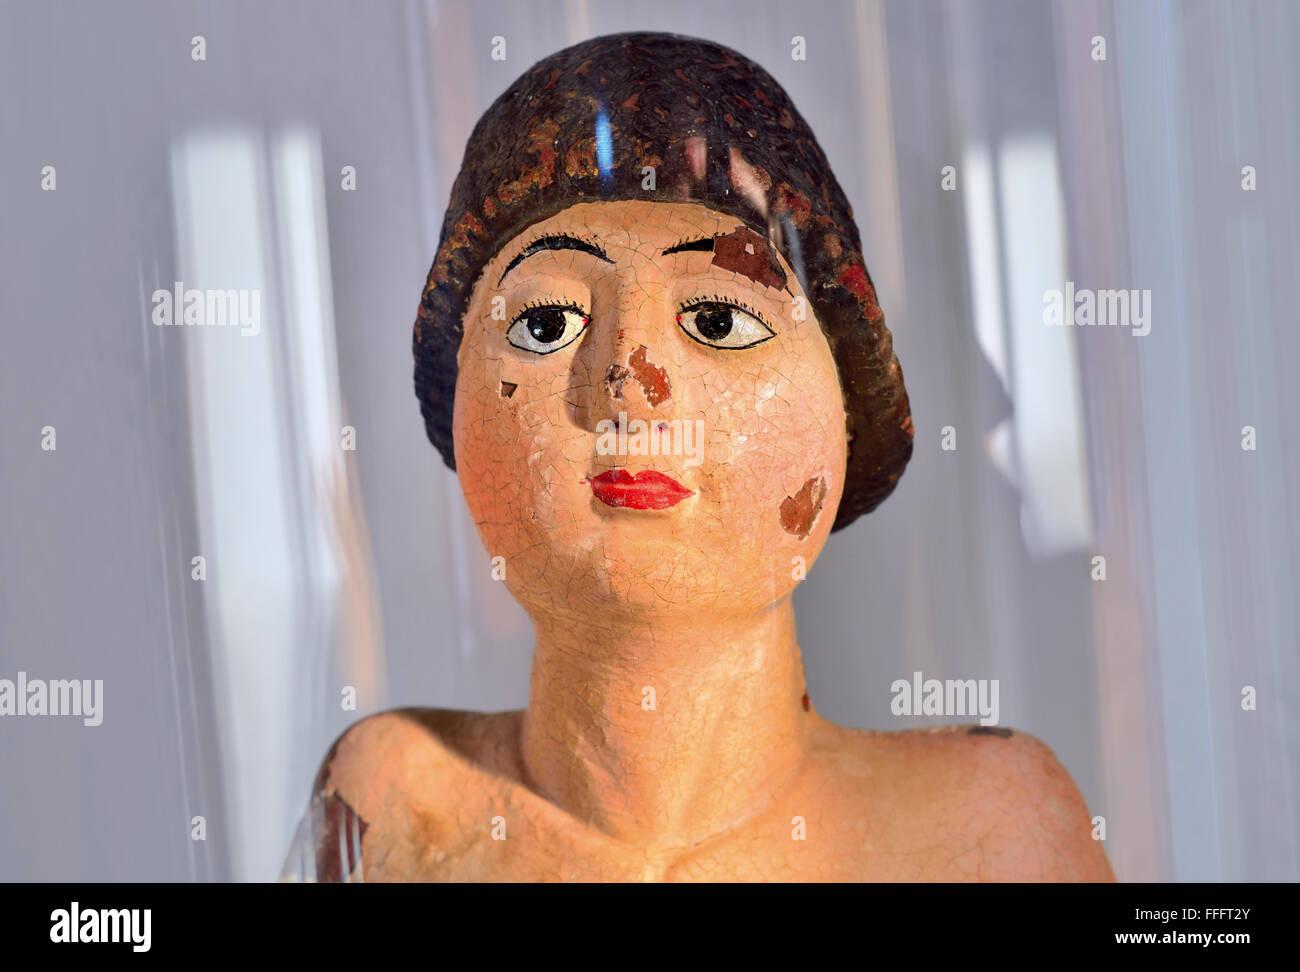 Portugal, Alentejo: Detail of the medieval statue of Saint Sebastian in the Museum of Arte Sacra in Mértola - Stock Image